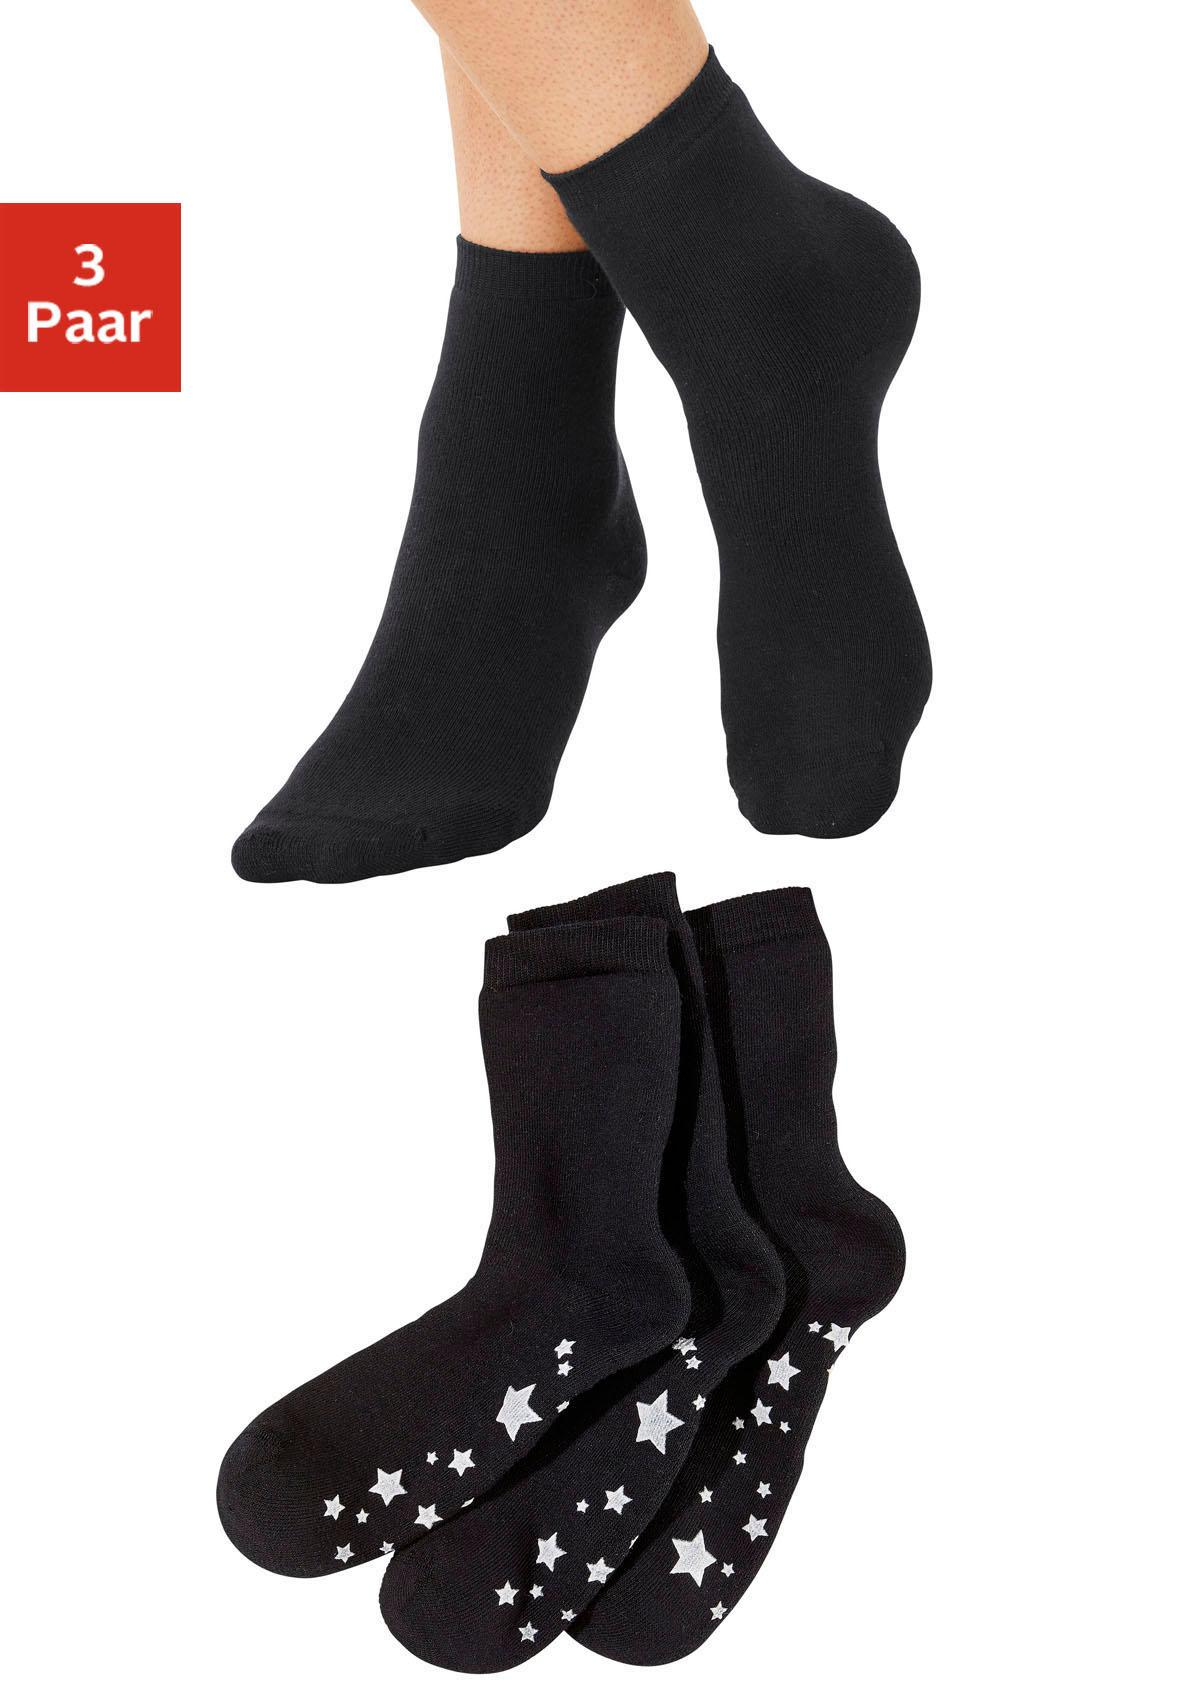 Lavana ABS-Socken (3 Paar)